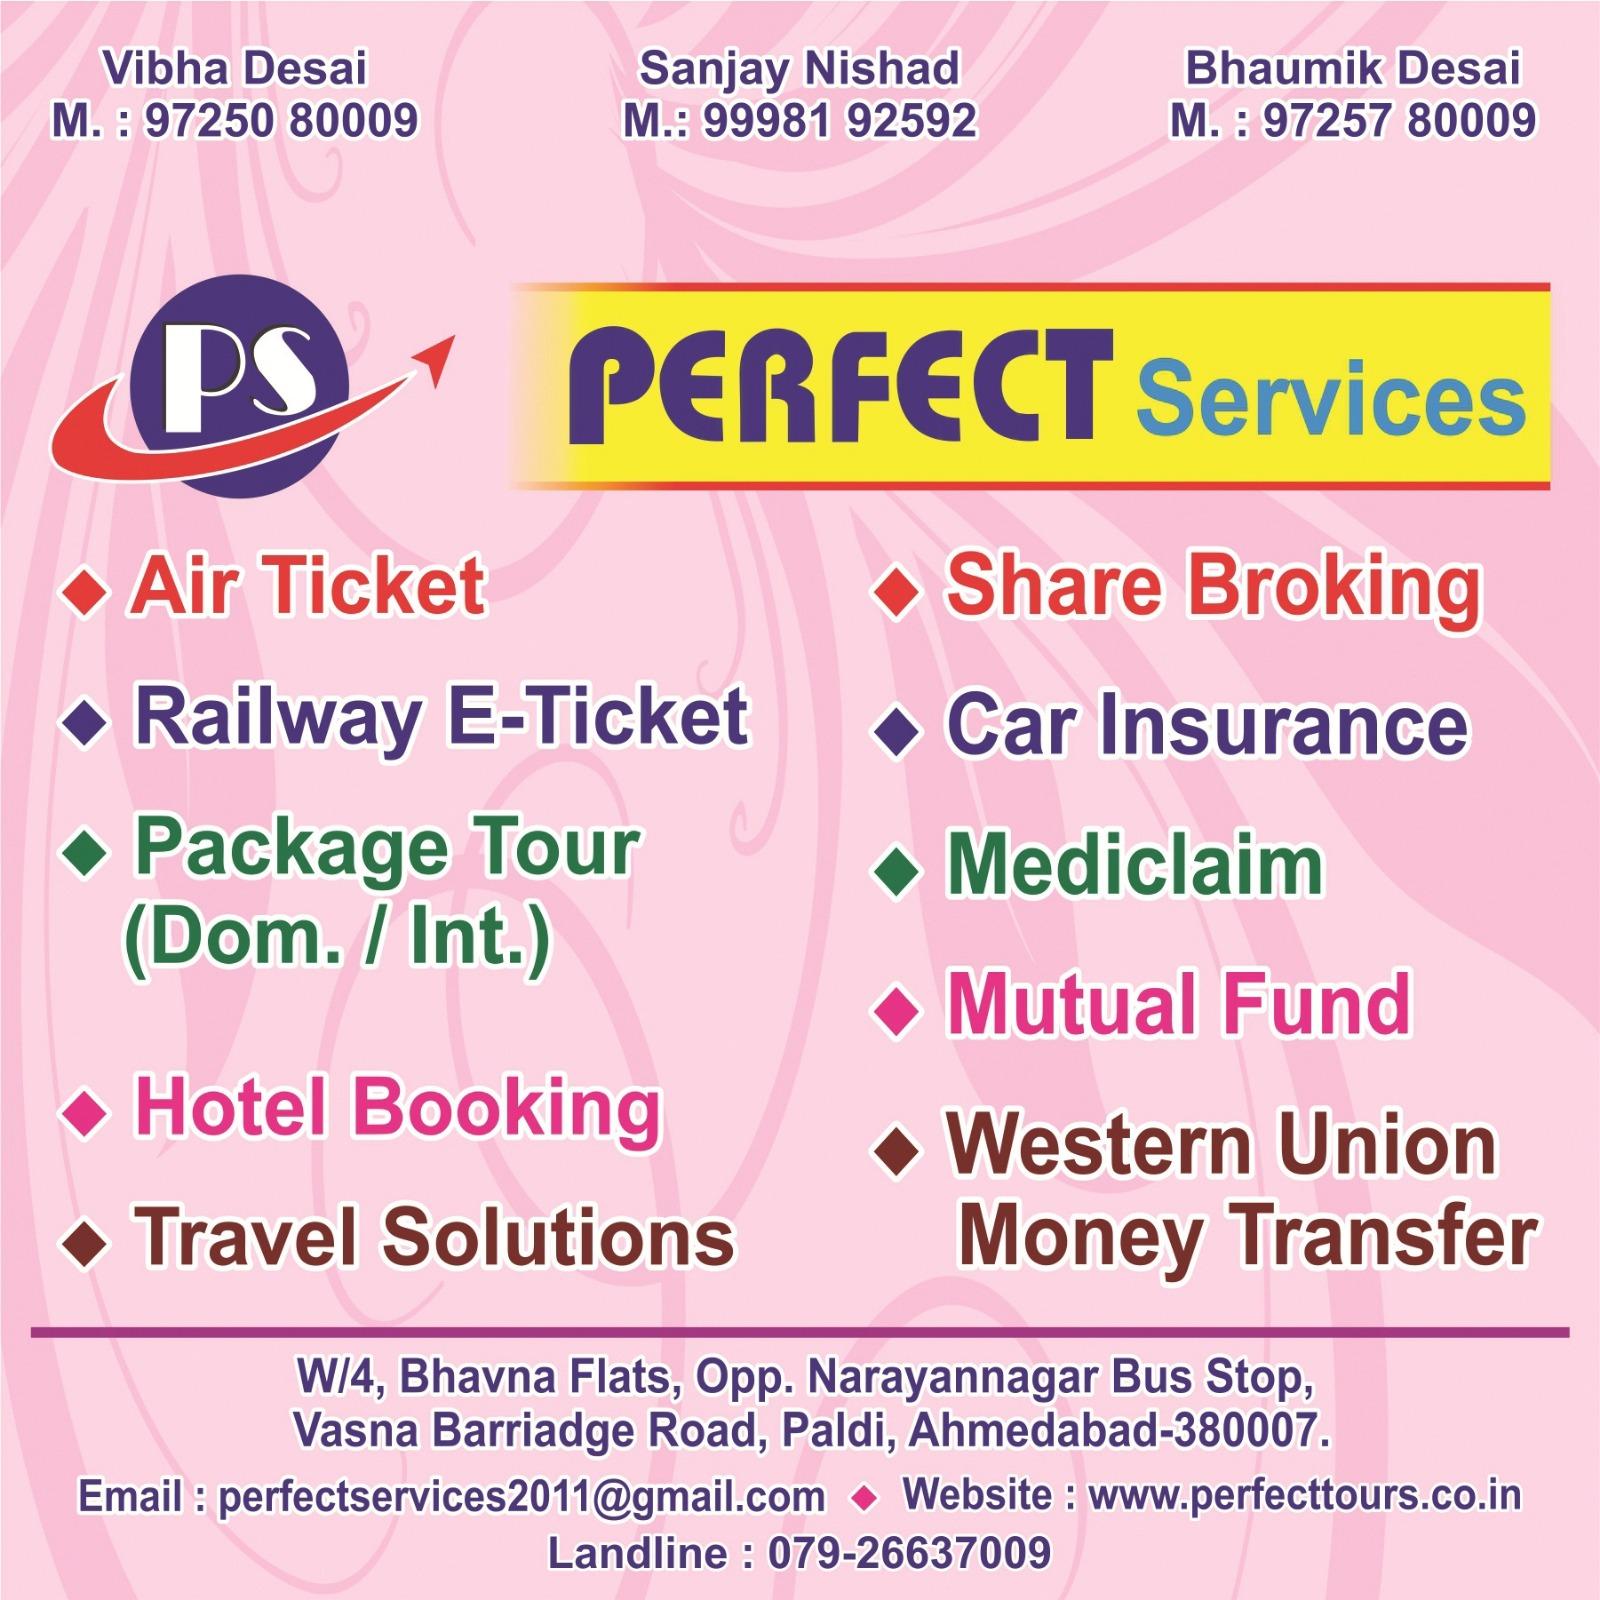 Top 10 Tour Operators in Bhavnagar, Packages | Sulekha